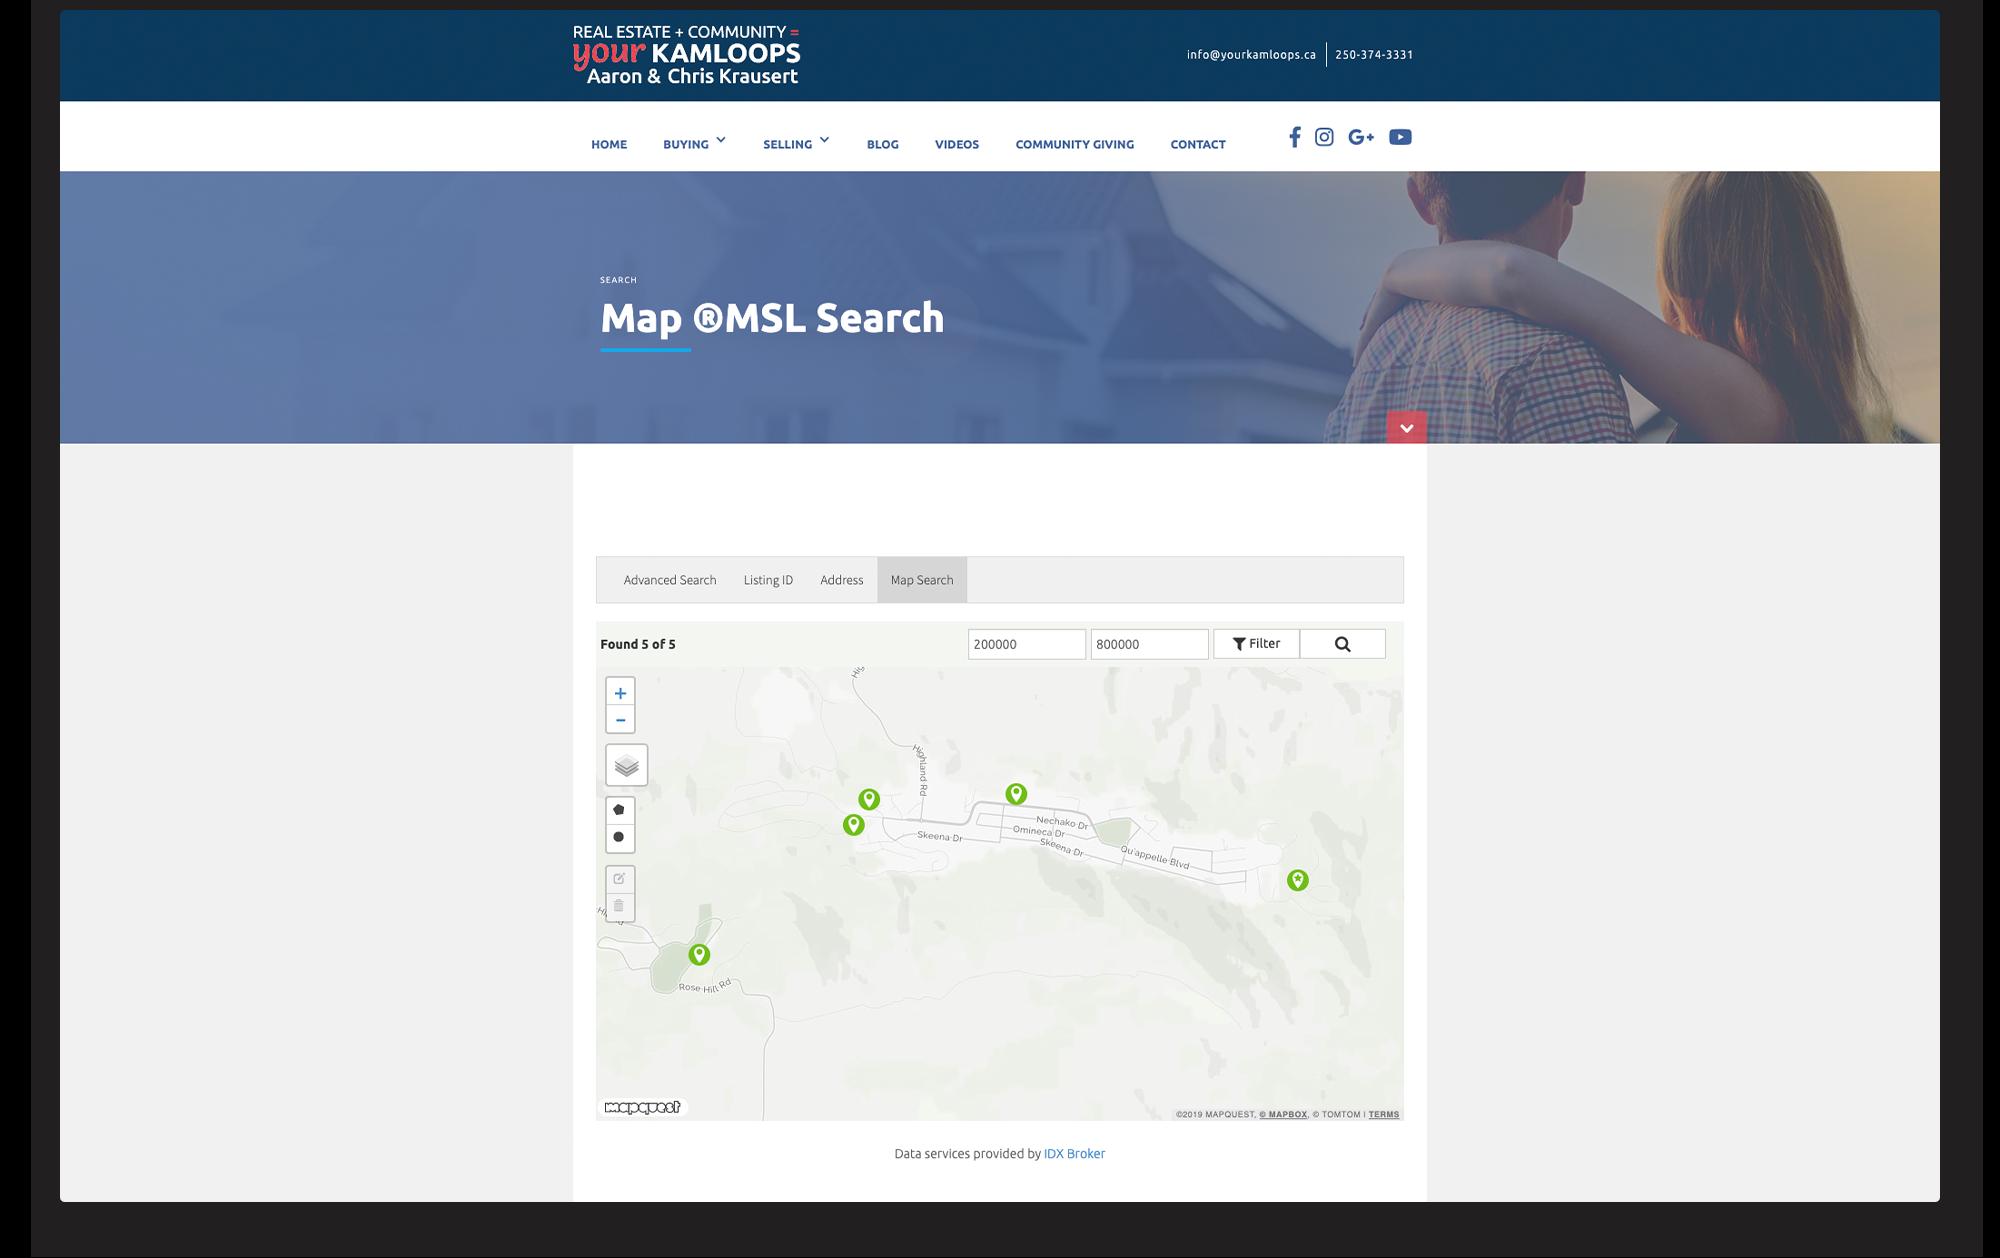 Desktop view of IDX search by map.